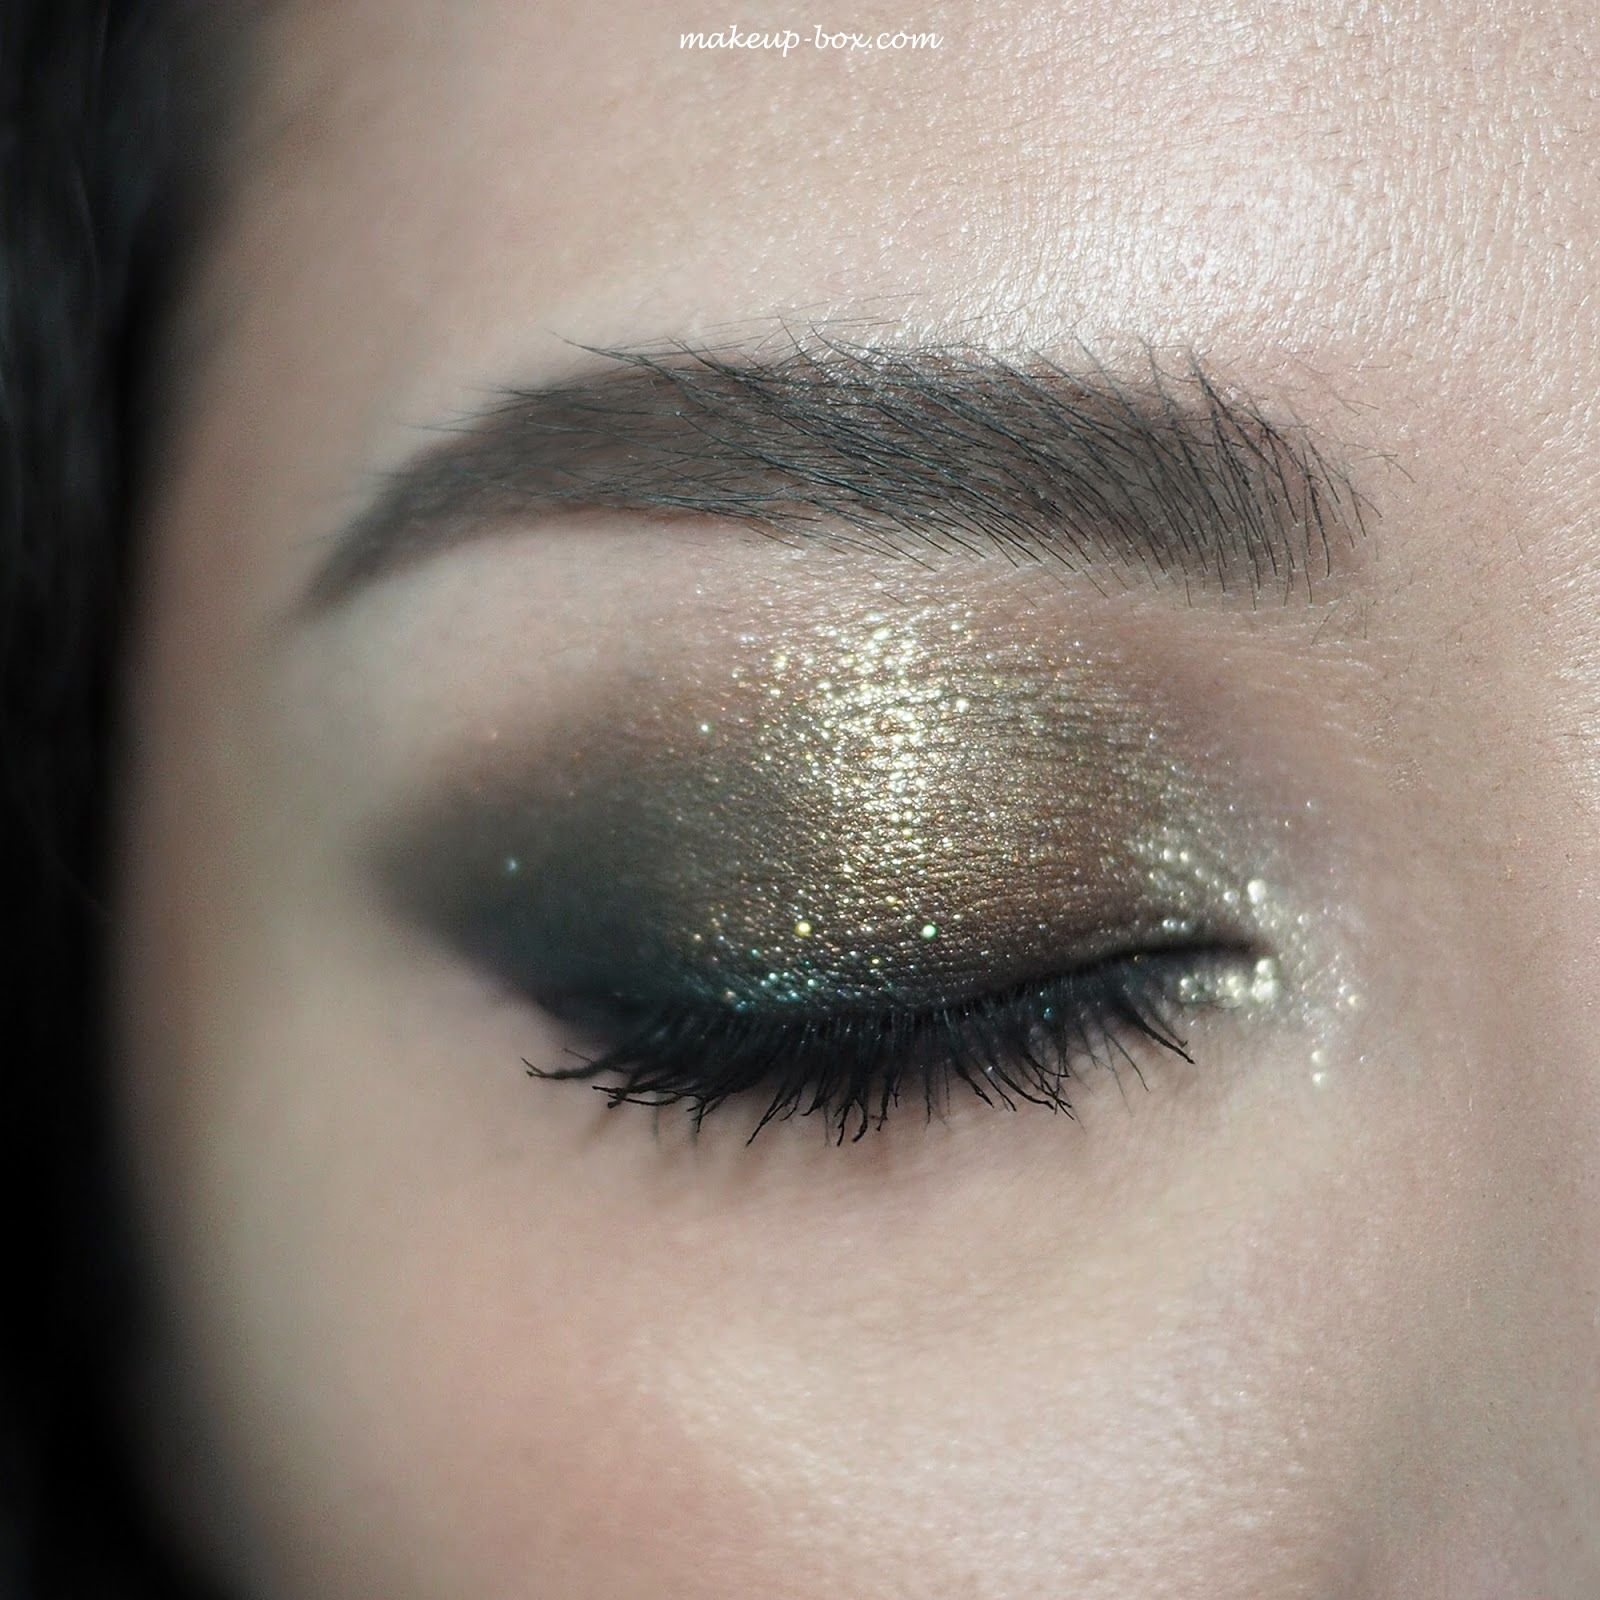 Victoria Beckham x Estee Lauder Makeup Collection London